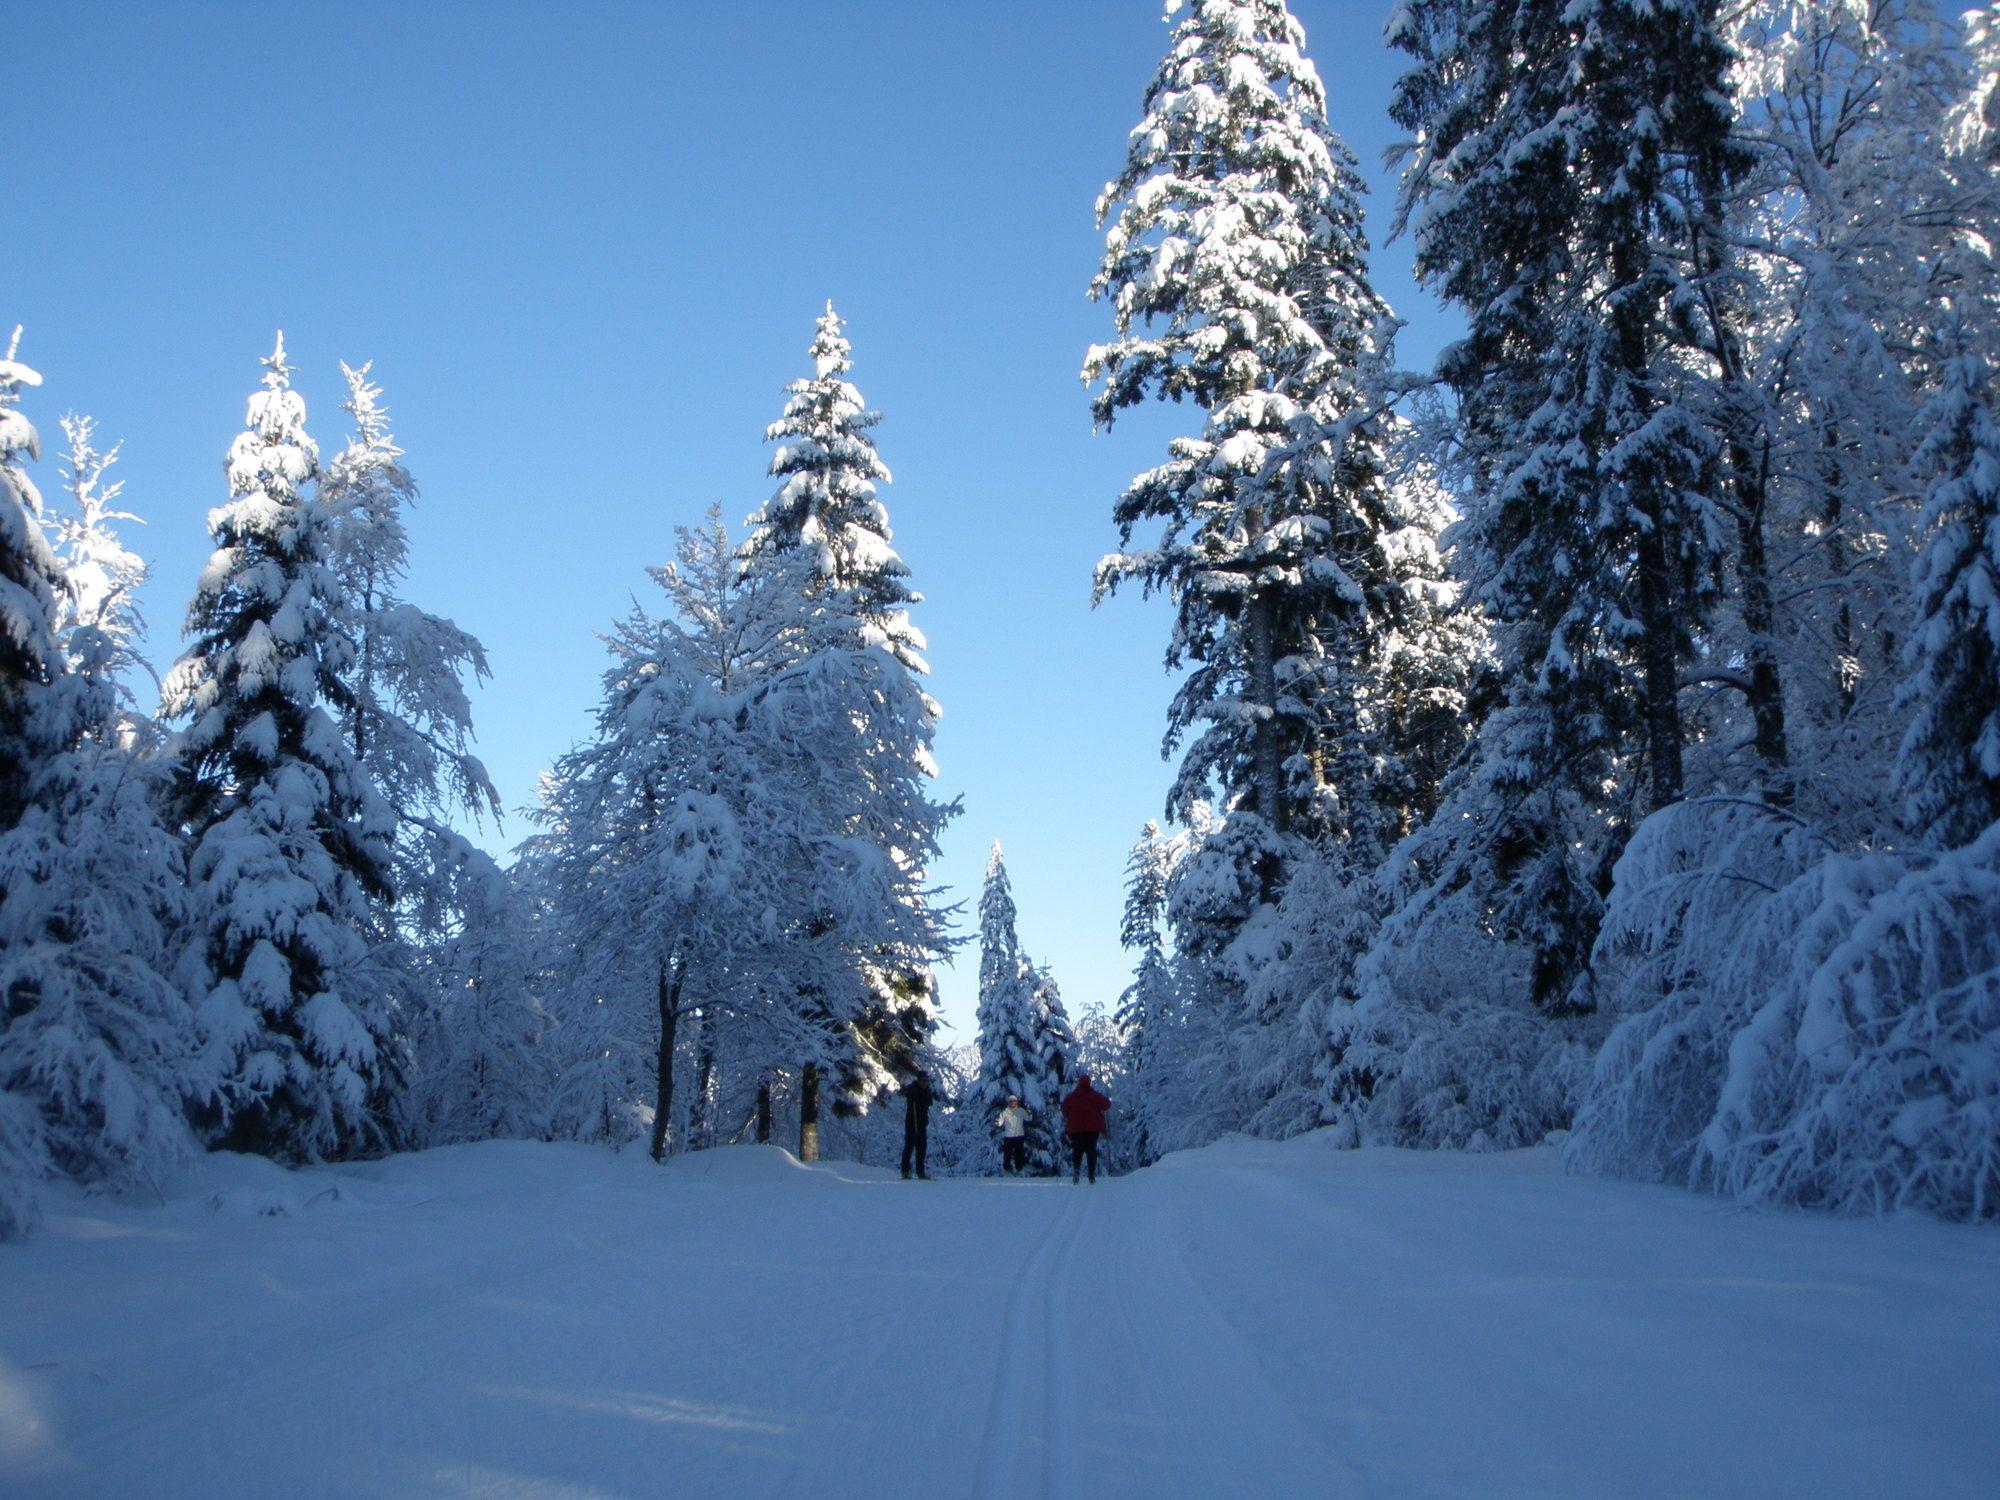 BERGFEX: Ski de fond Les Fourgs / Herba: Ski de fond Les Fourgs / Herba